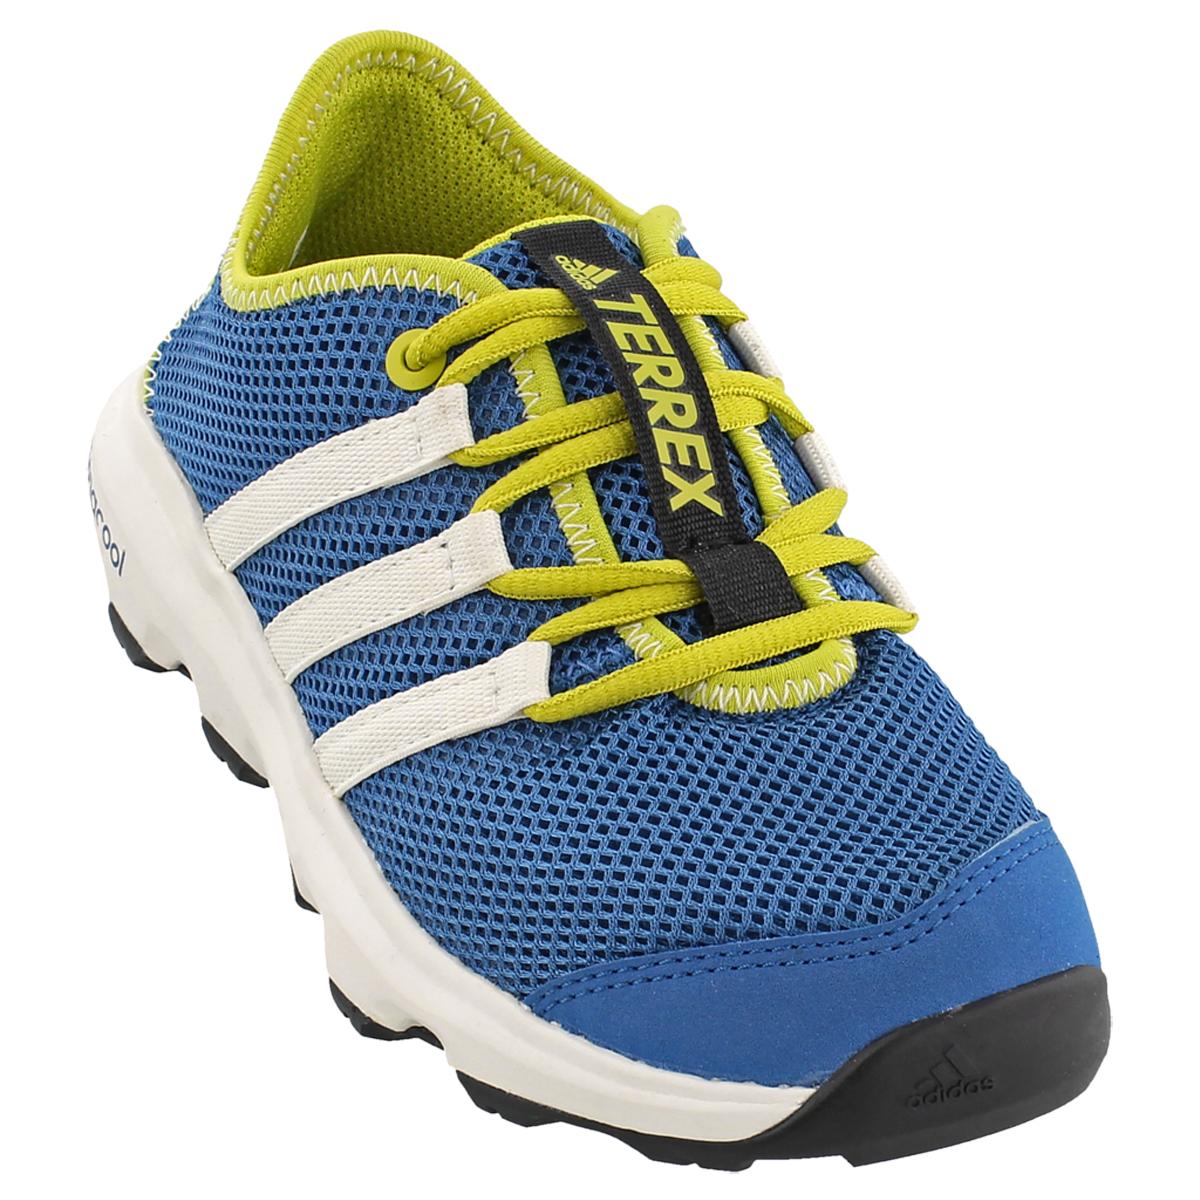 Adidas Kids Terrex Climacool Voyager - Blue (BB1944)